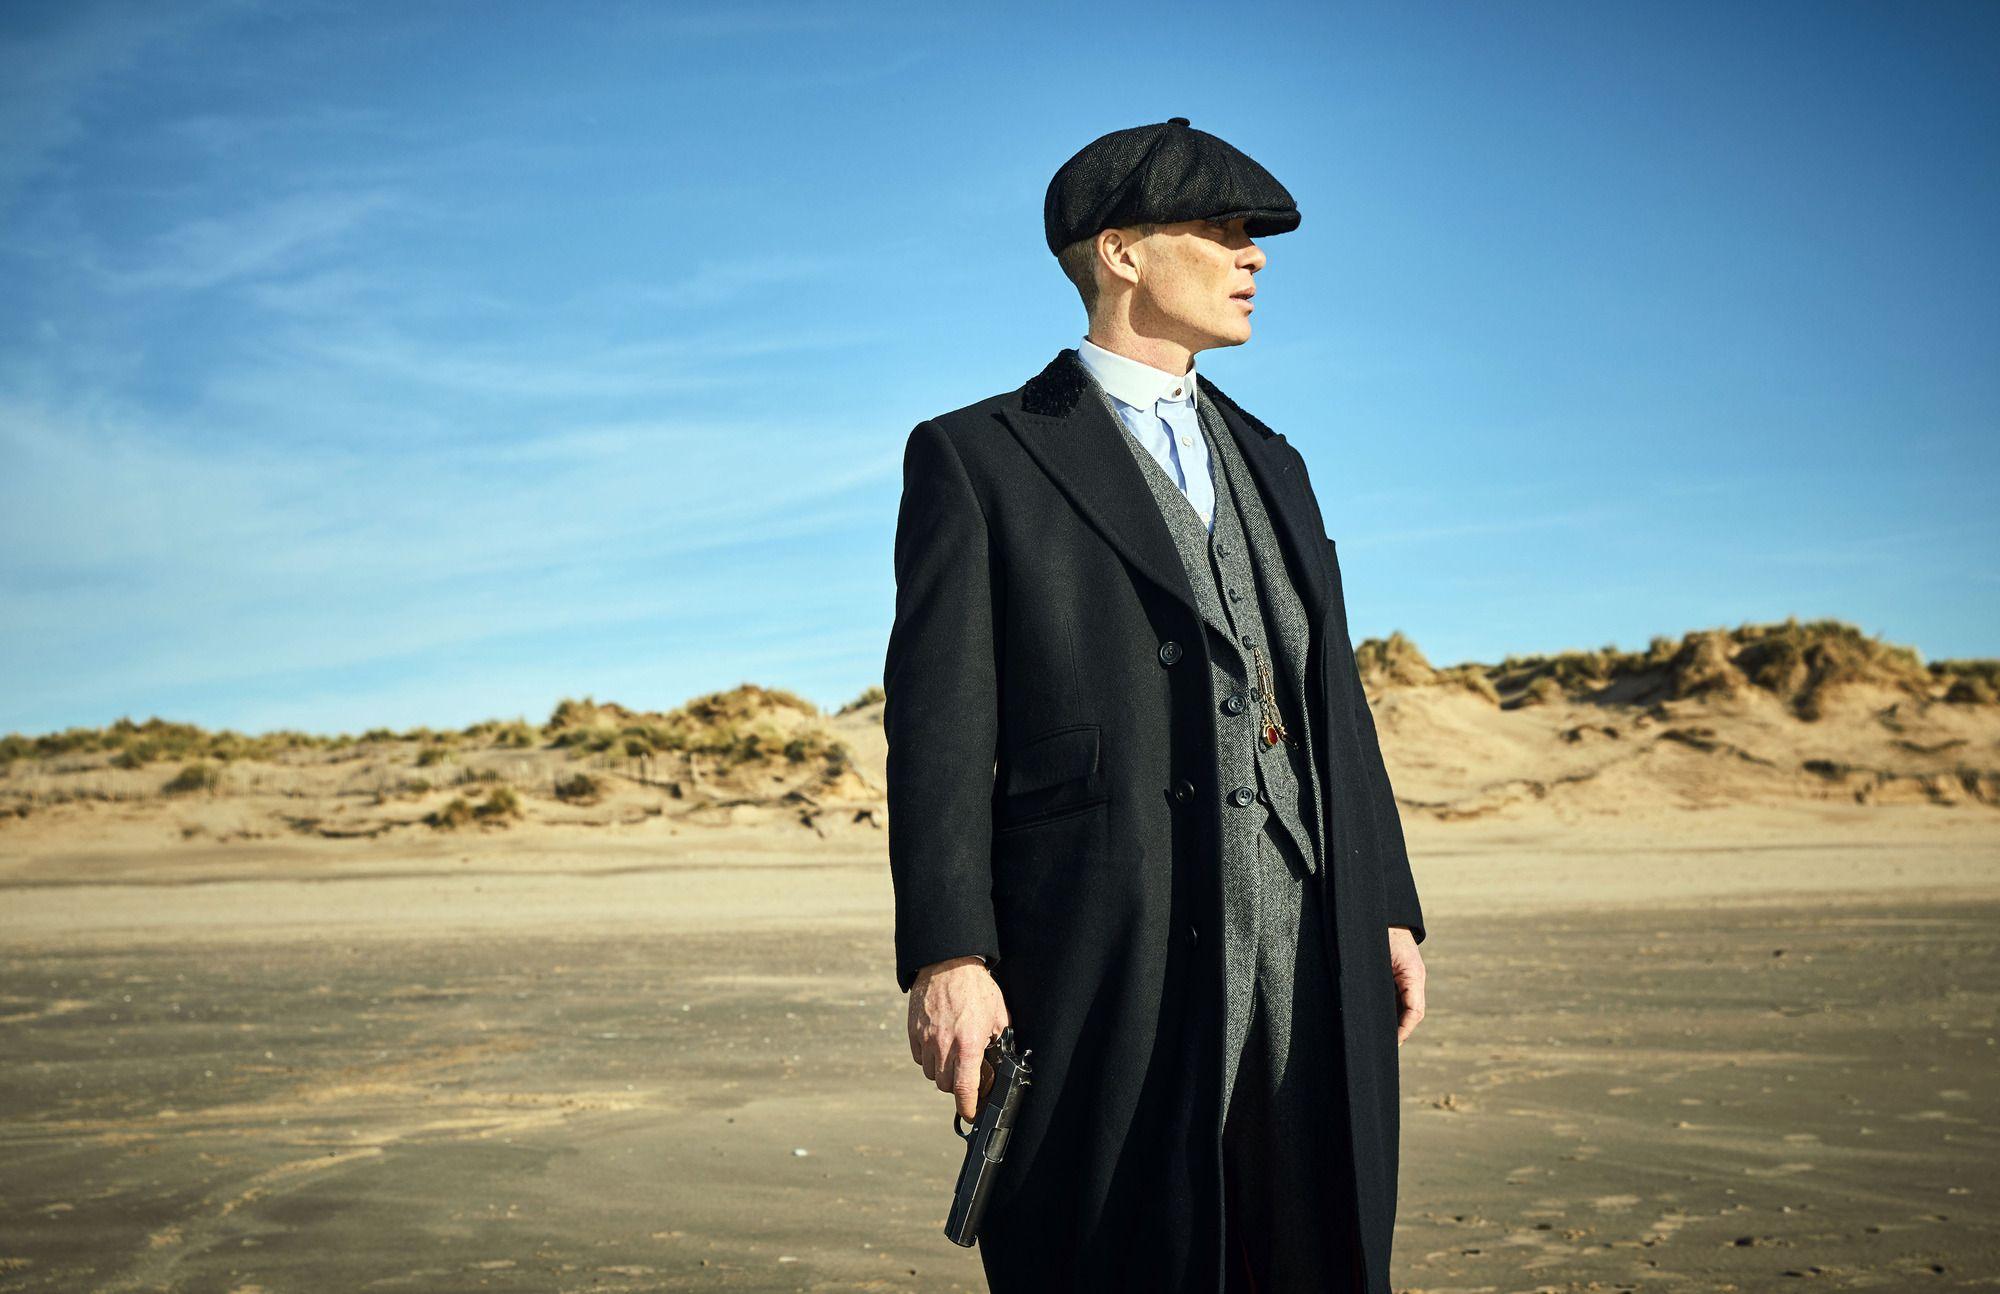 03e4a5f3bcab Peaky Blinders season 5 - Release date, cast, plot